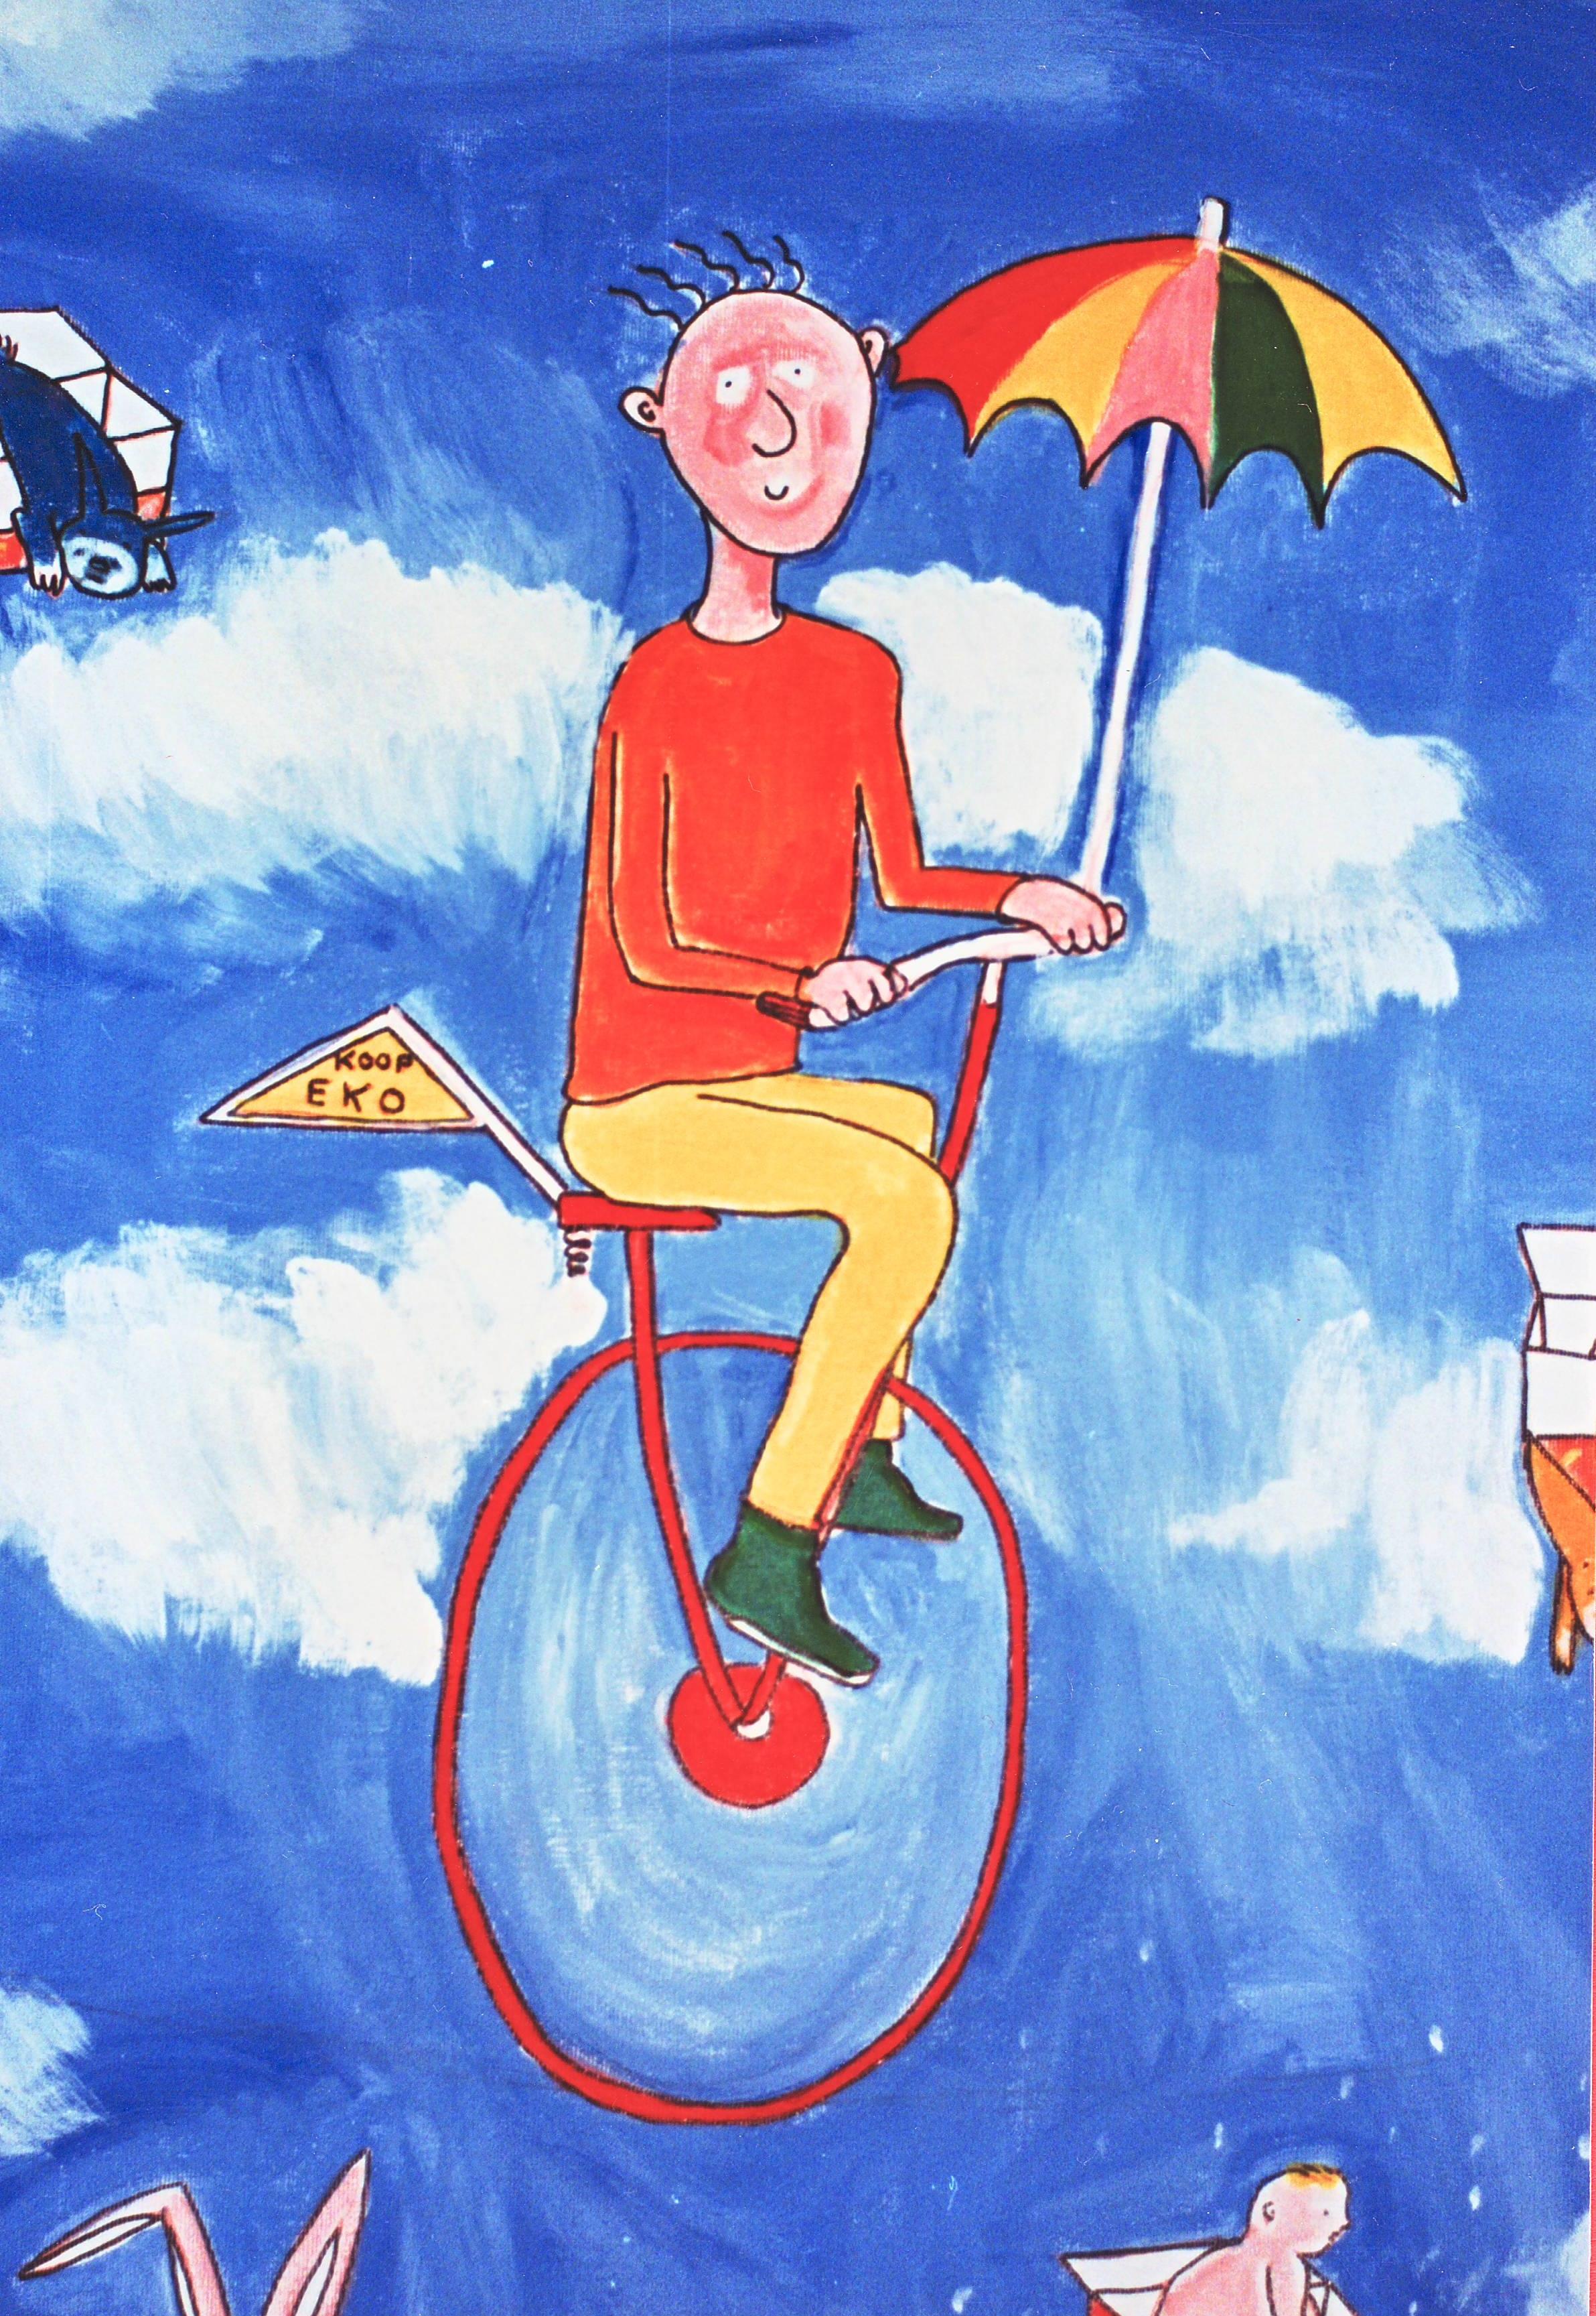 Soja droom Miep Bos eko fragment 1997